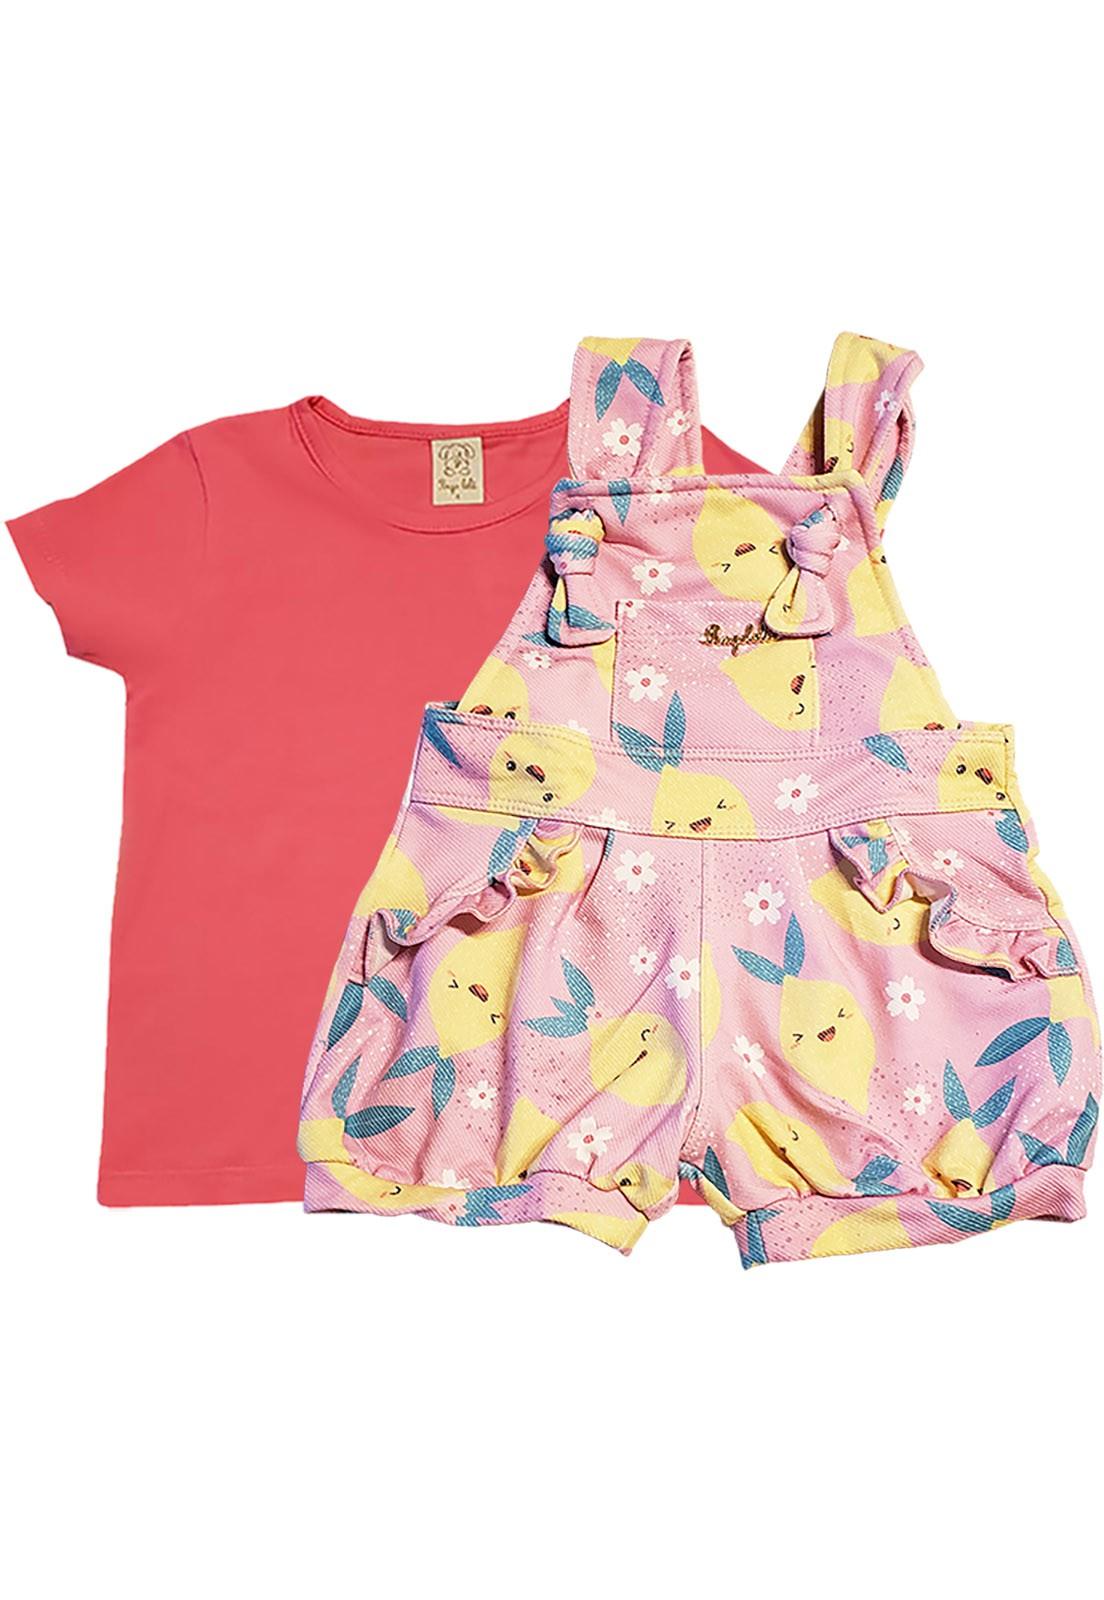 Conjunto Infantil Jardineira cotton Jeans e Camiseta  manga curta  Pingo Lelê Limão Rosa e Goiaba